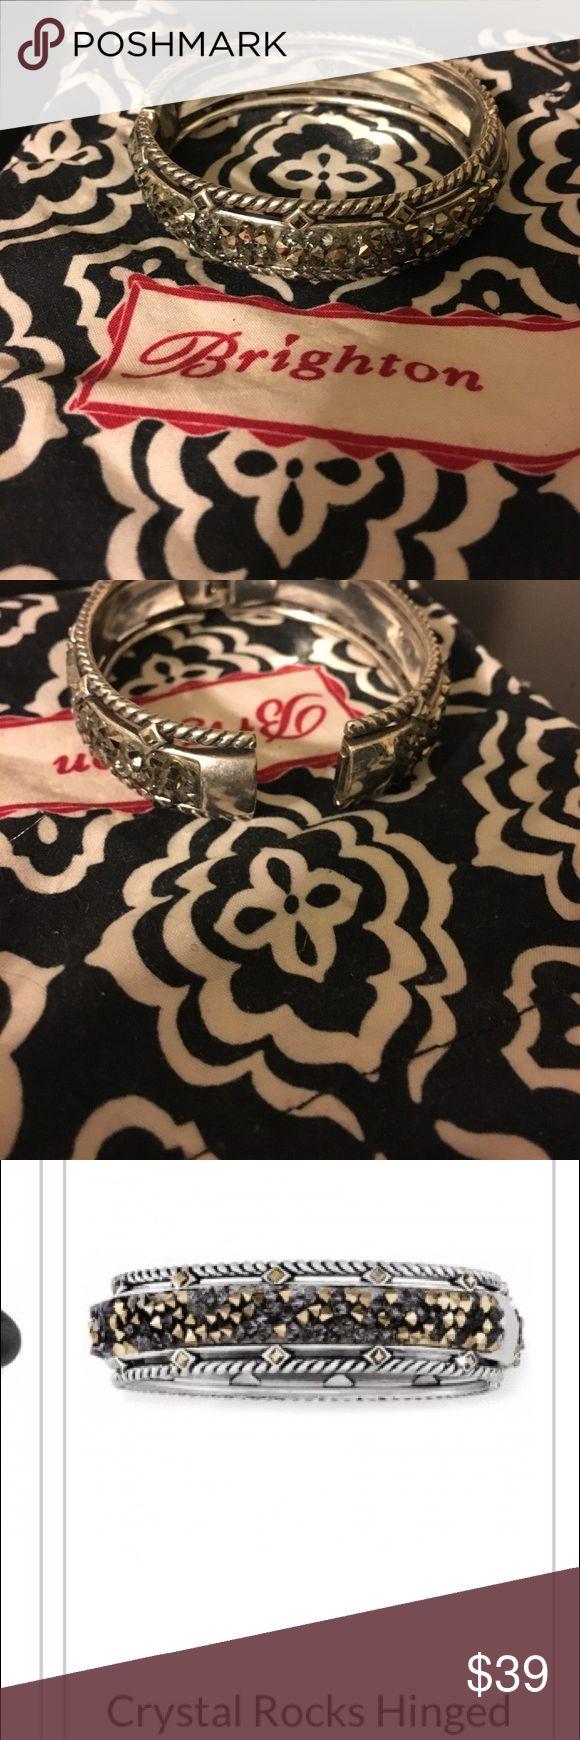 Brighton bangle bracelet Brighton clasping bangle bracelet Brighton Jewelry Bracelets